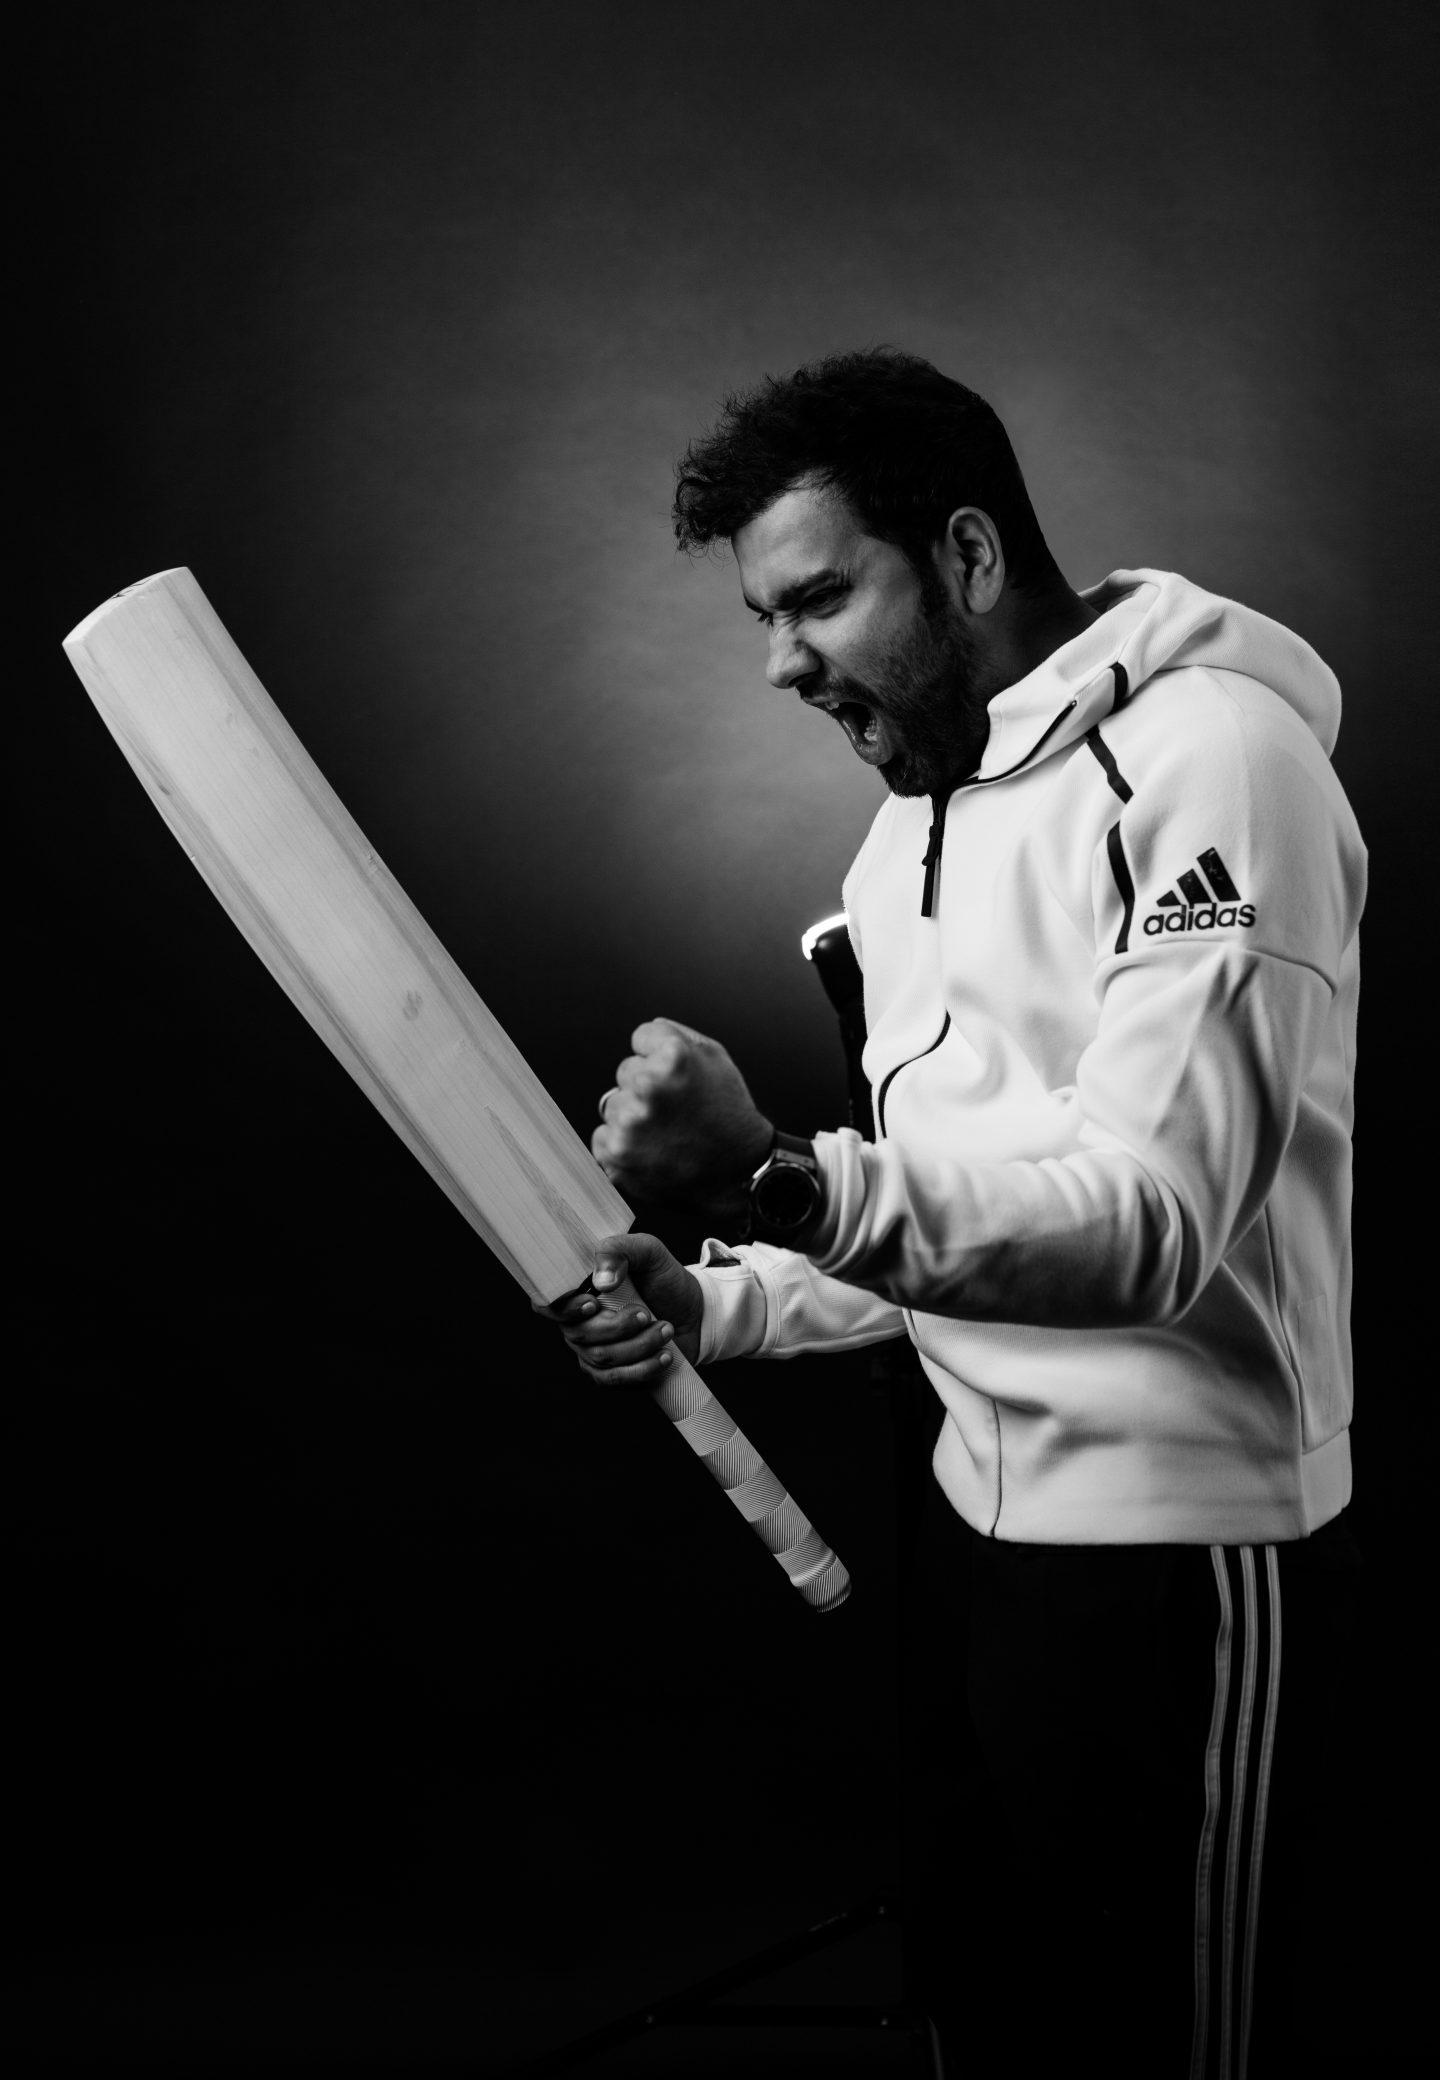 man with cricket bat celebrating rohit sharma cricket history win captain gameplanA interview